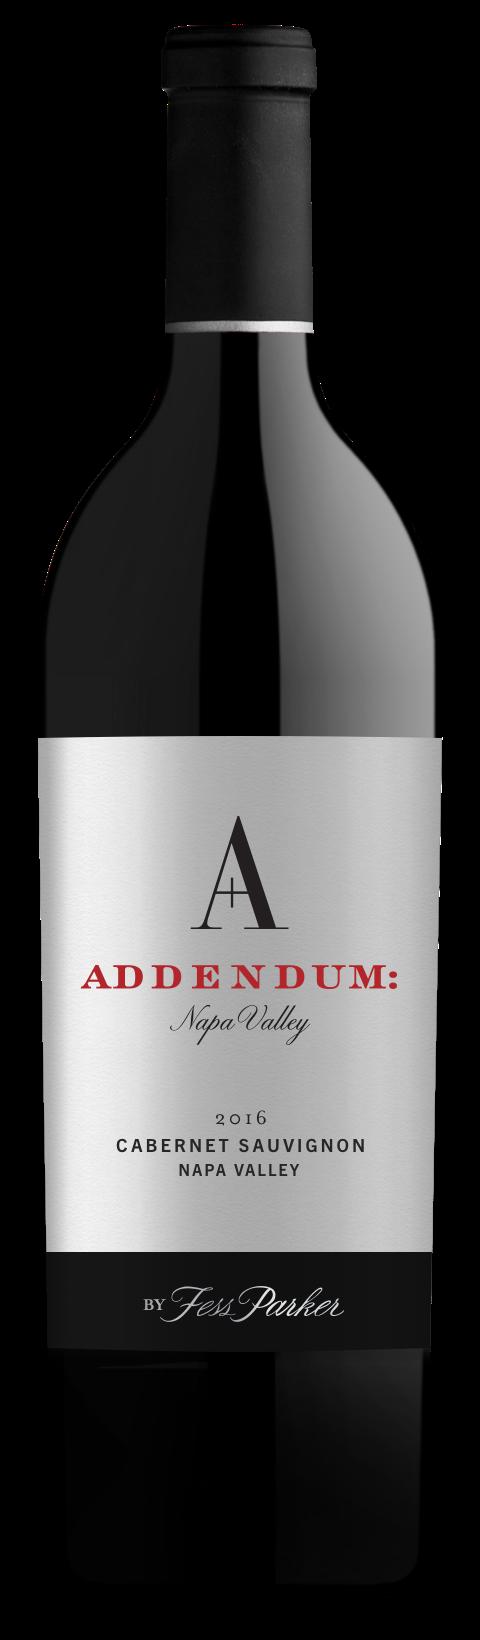 2016 Addendum Cabernet Sauvignon, Napa Valley - bottle shot